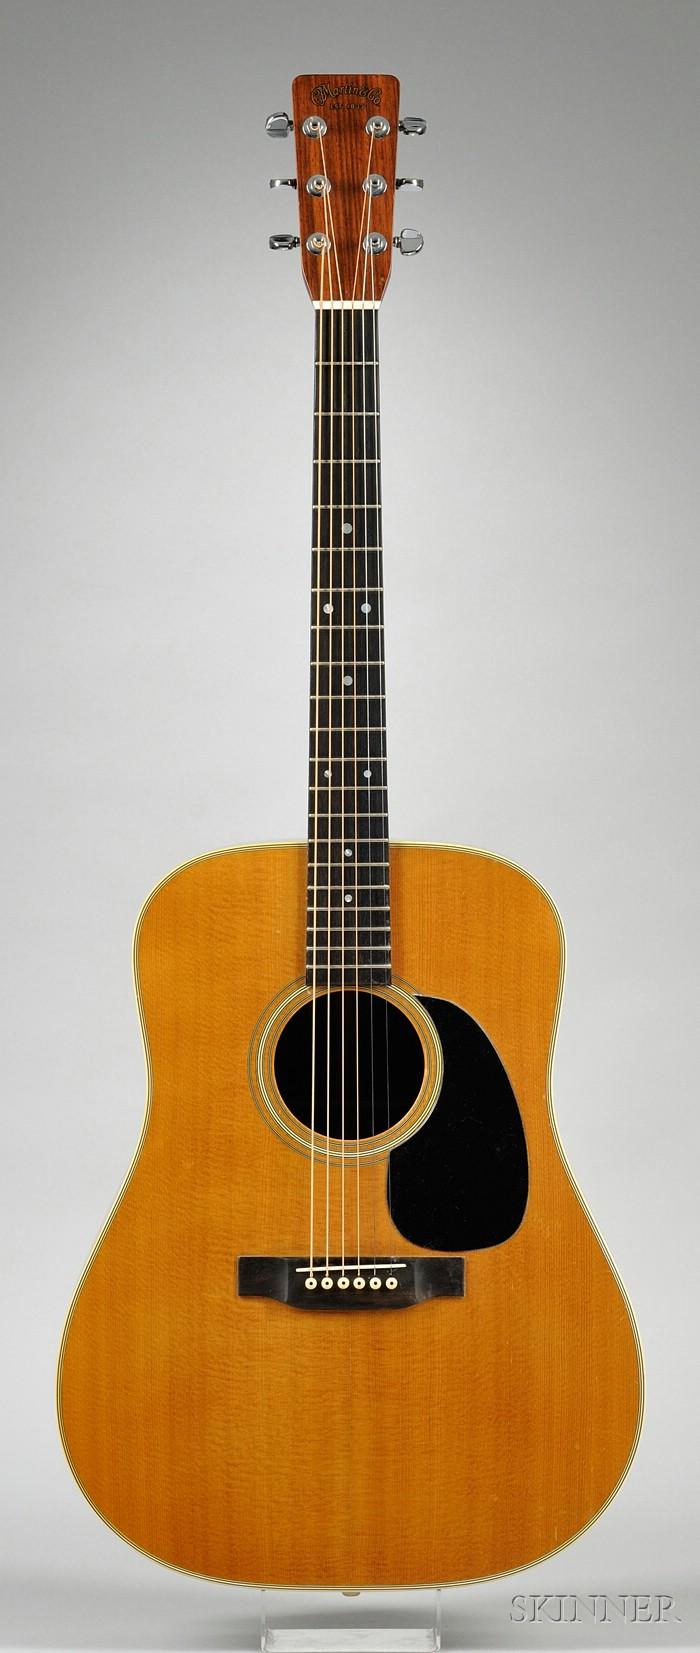 American Guitar, C.F. Martin & Company, Nazareth, 1971, Style D-28